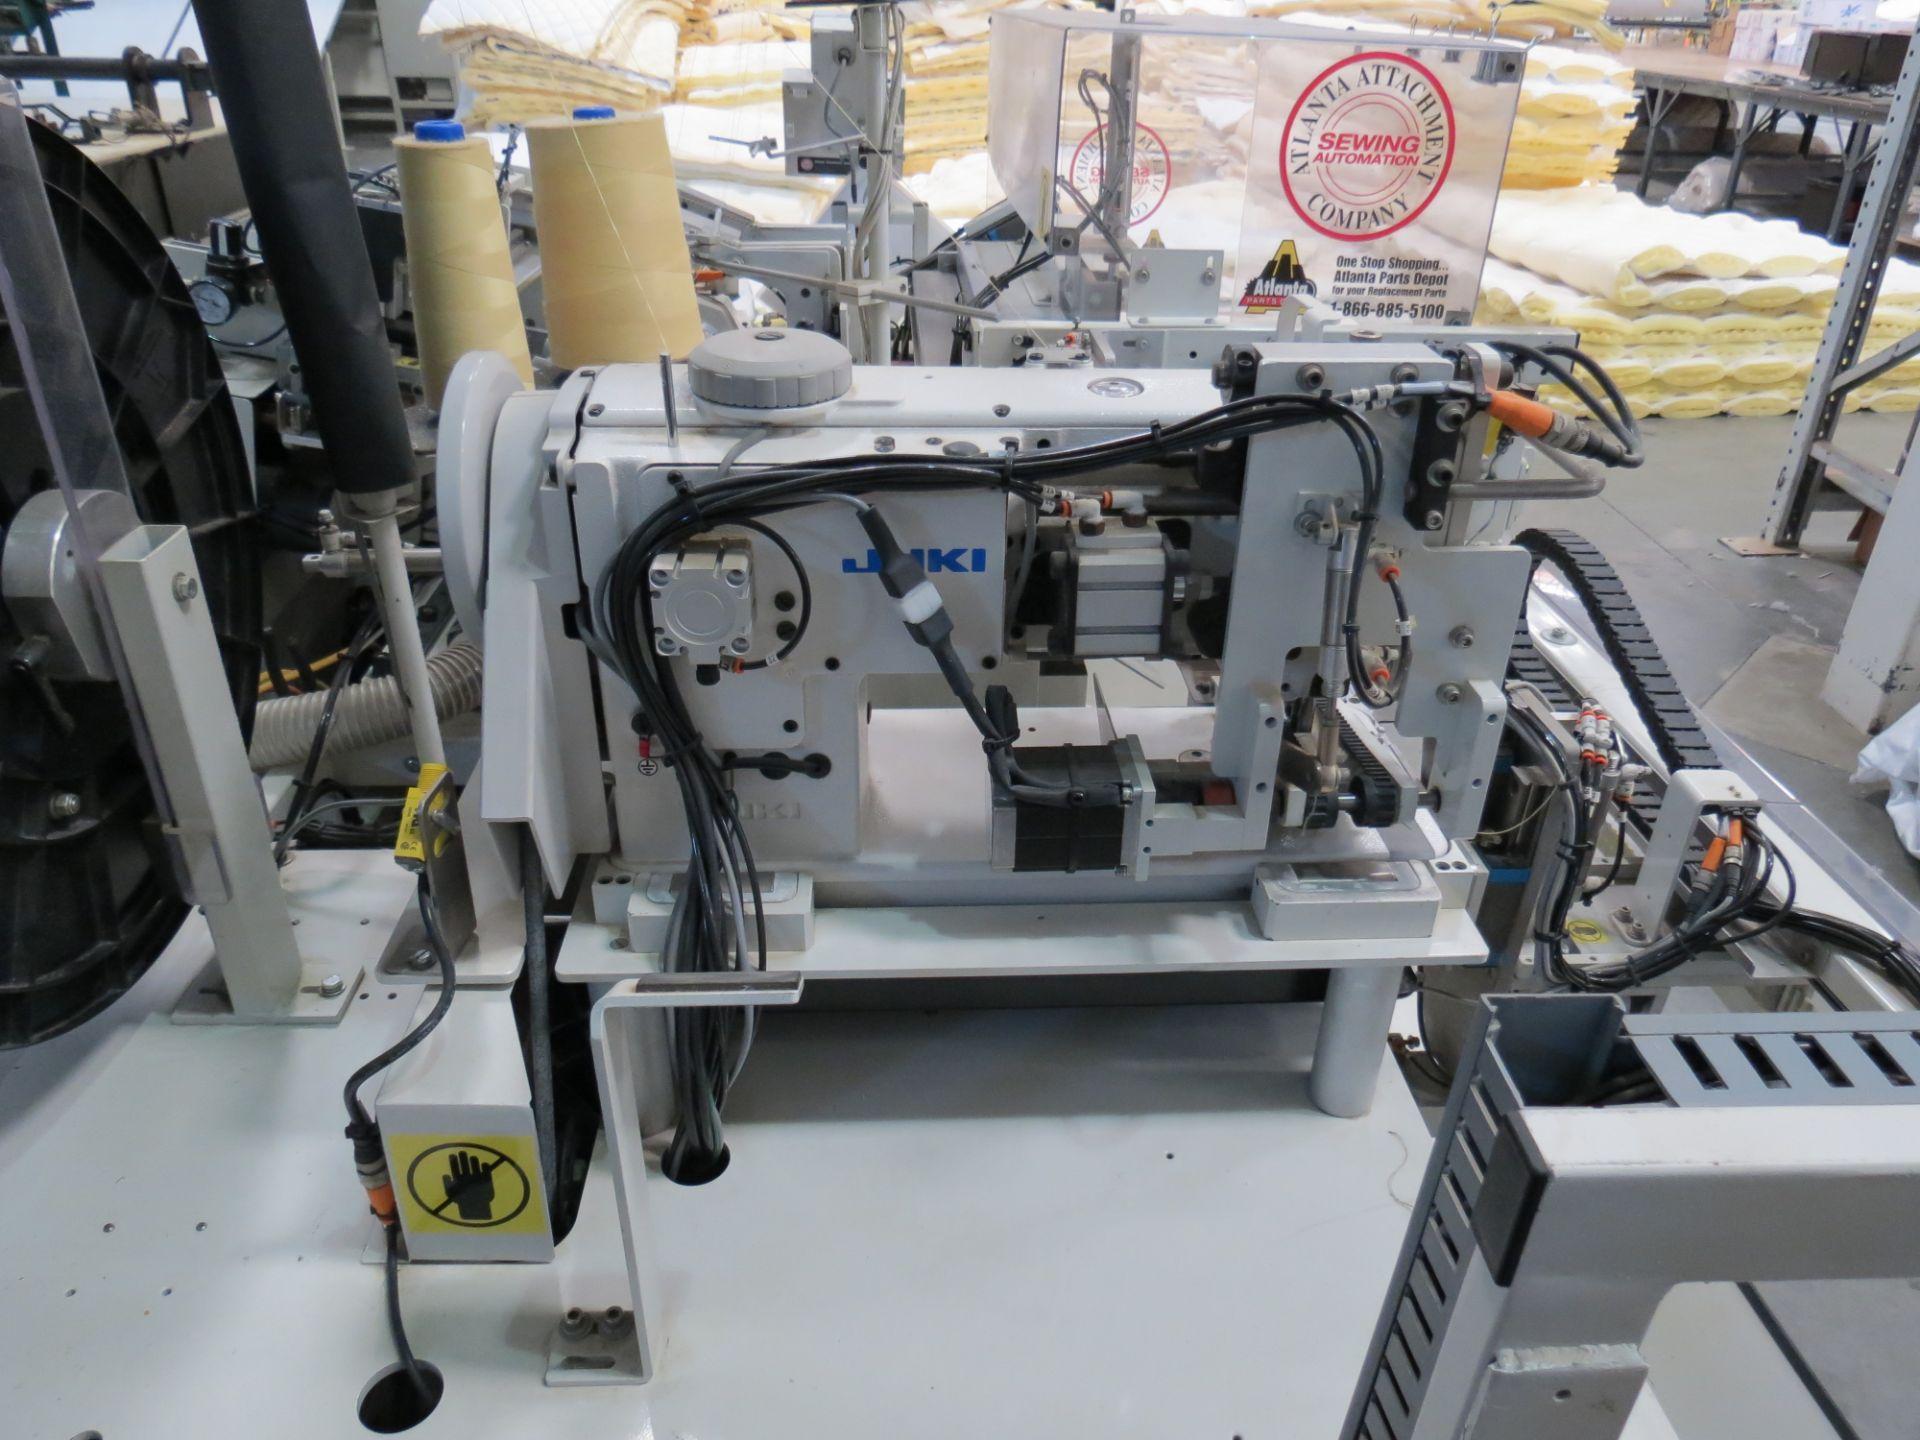 Atlanta Attachment Company, 4300BBorder/Attach Handles Sewing Machine, 220V, SN:209227071609, Juki - Image 5 of 11